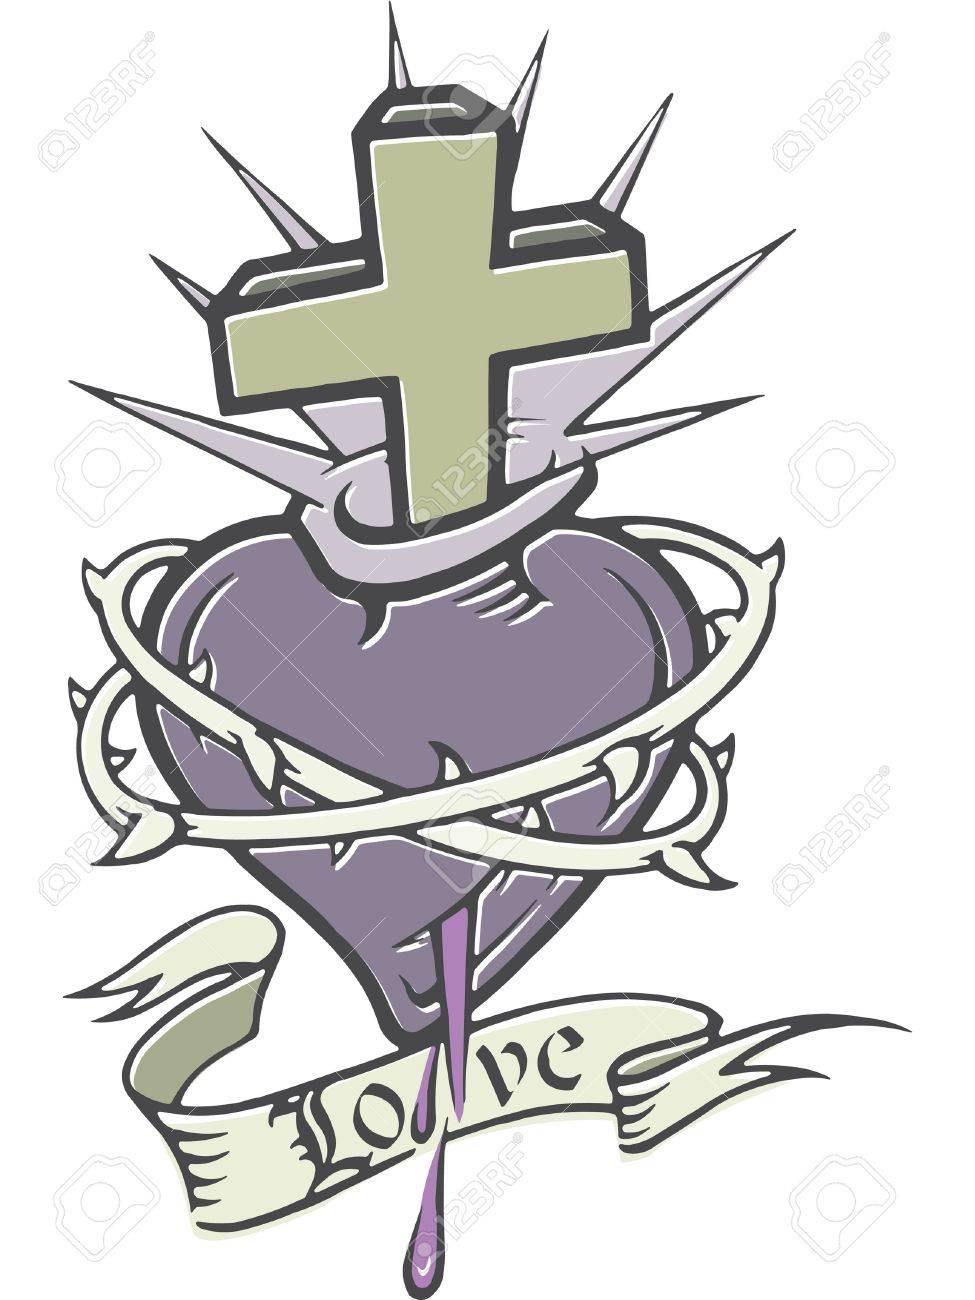 A stencil of a bleeding heart with thorns a cross and a banner a stencil of a bleeding heart with thorns a cross and a banner stock photo buycottarizona